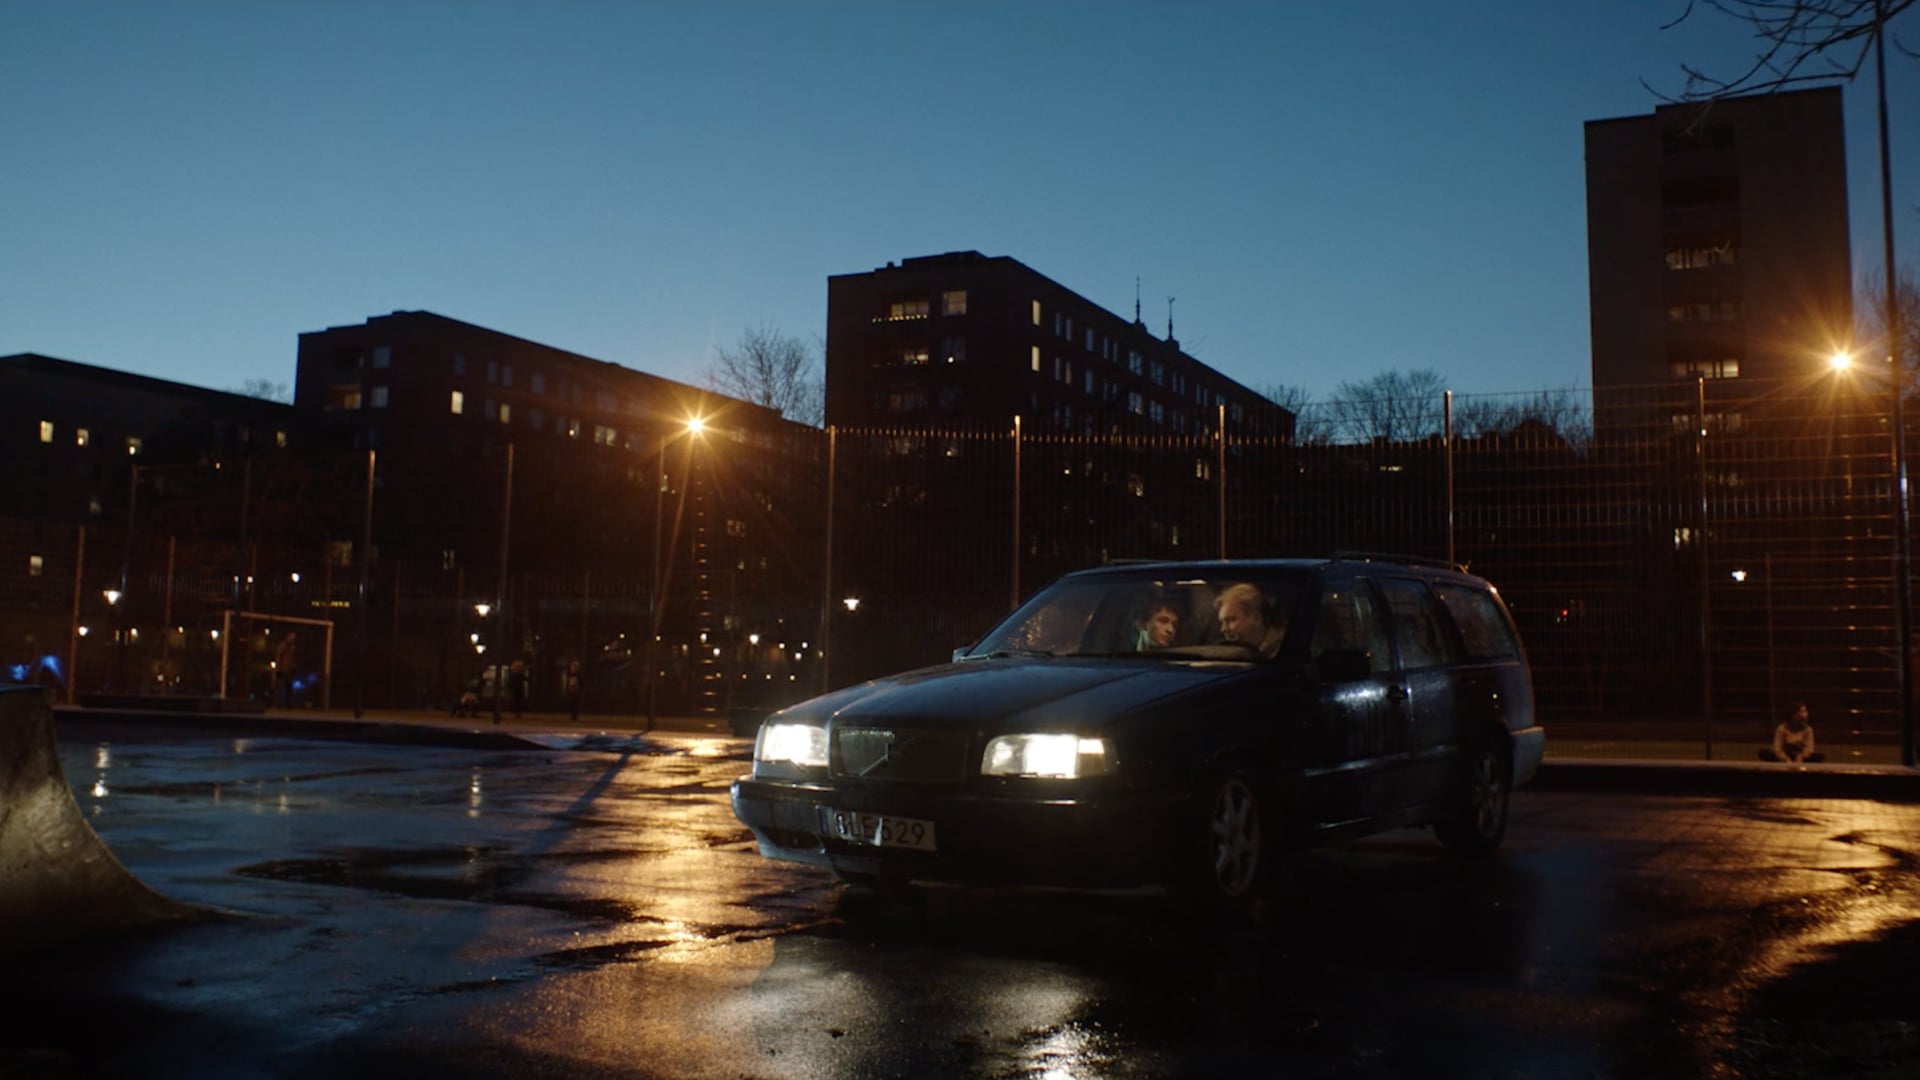 LINA SÖDERSTRÖM | KRY - Need to Talk to Someone